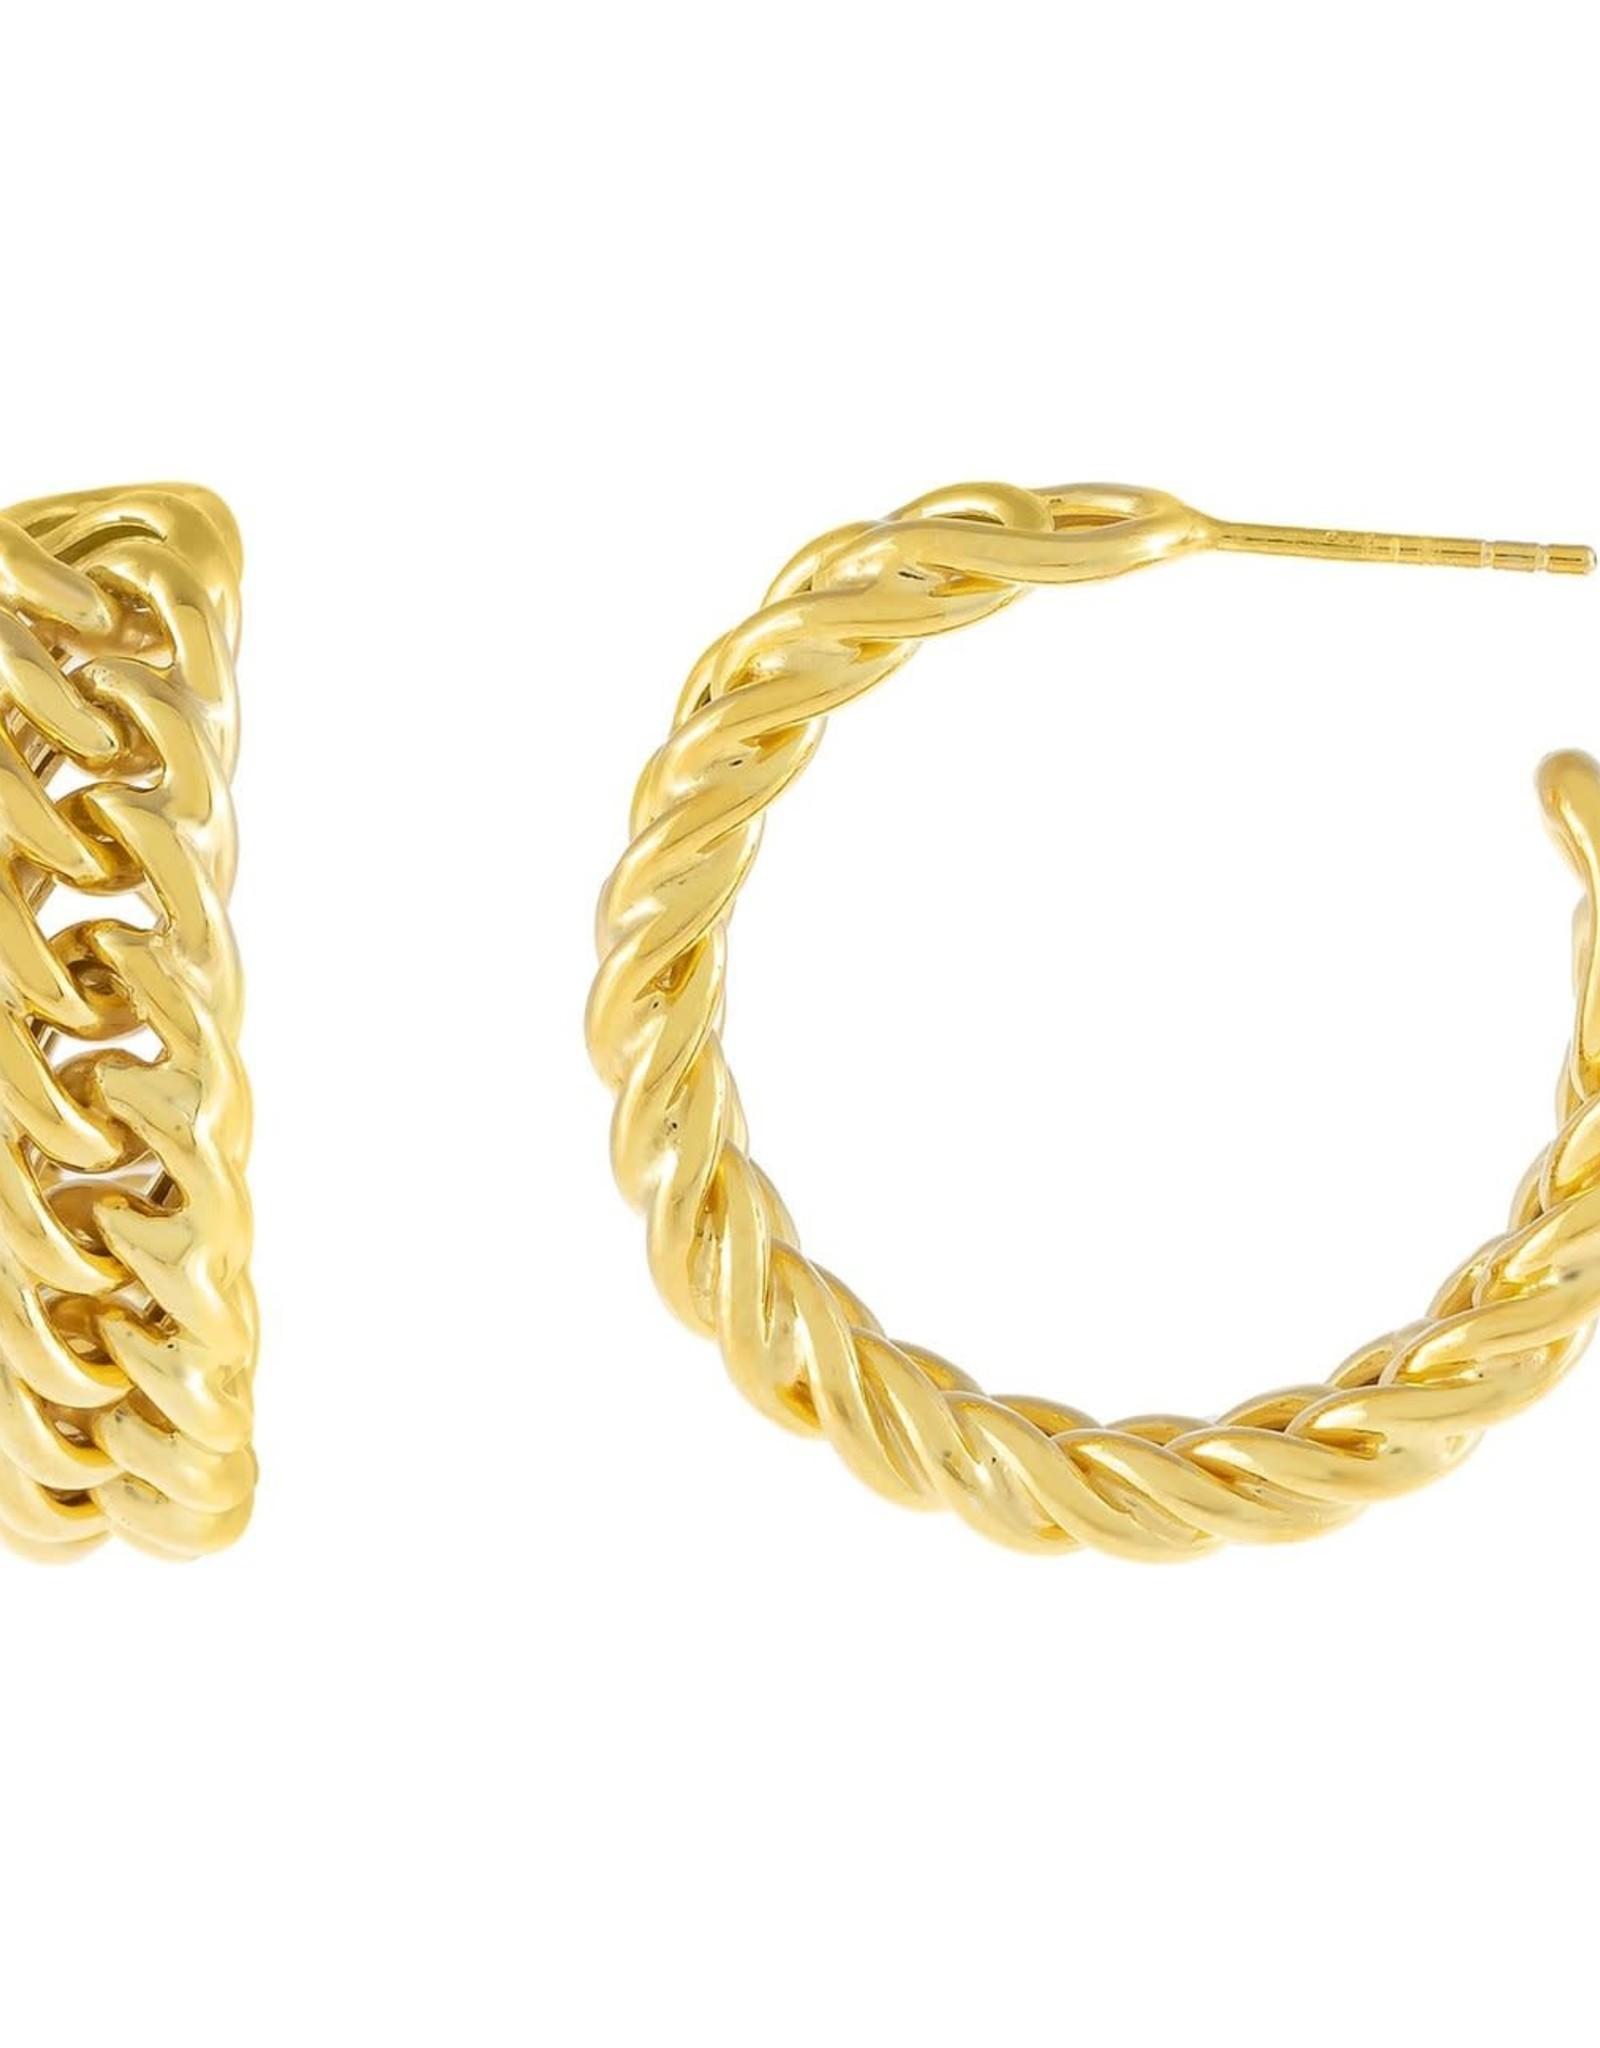 Adinas Chunky Double Curb Chain Hoop Earring